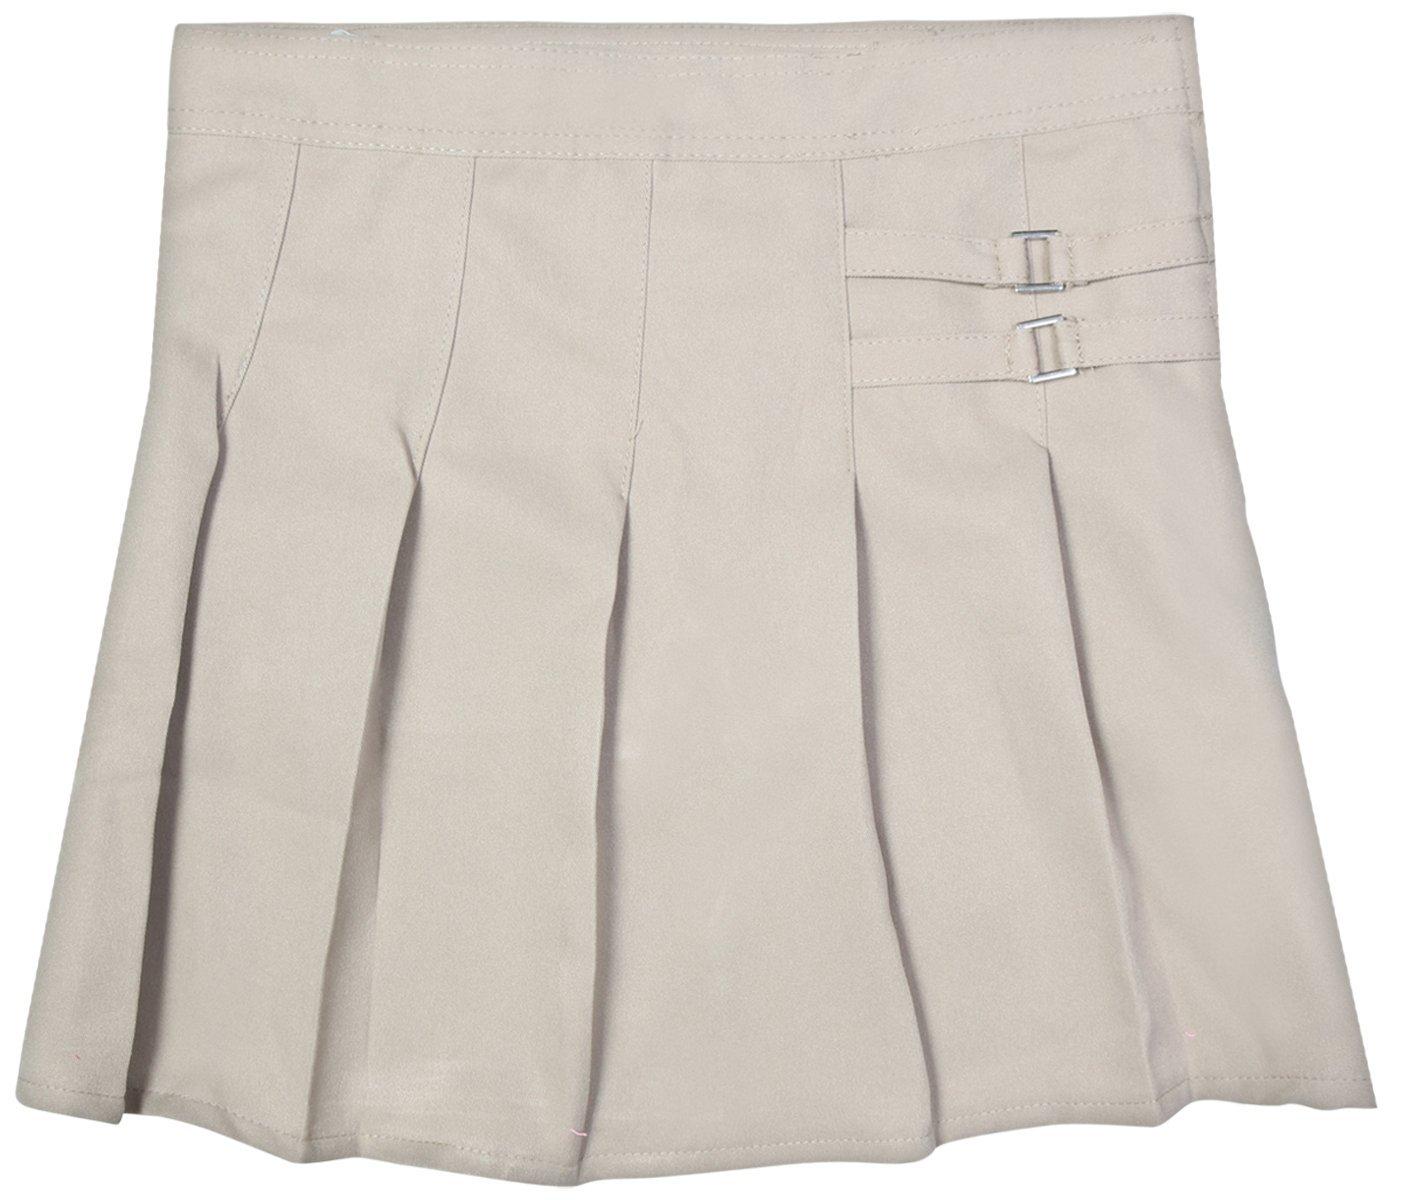 Beverly Hills Polo Club Girls School Uniform Double Waist Tab Pleated Scooted, Khaki, Size 5'